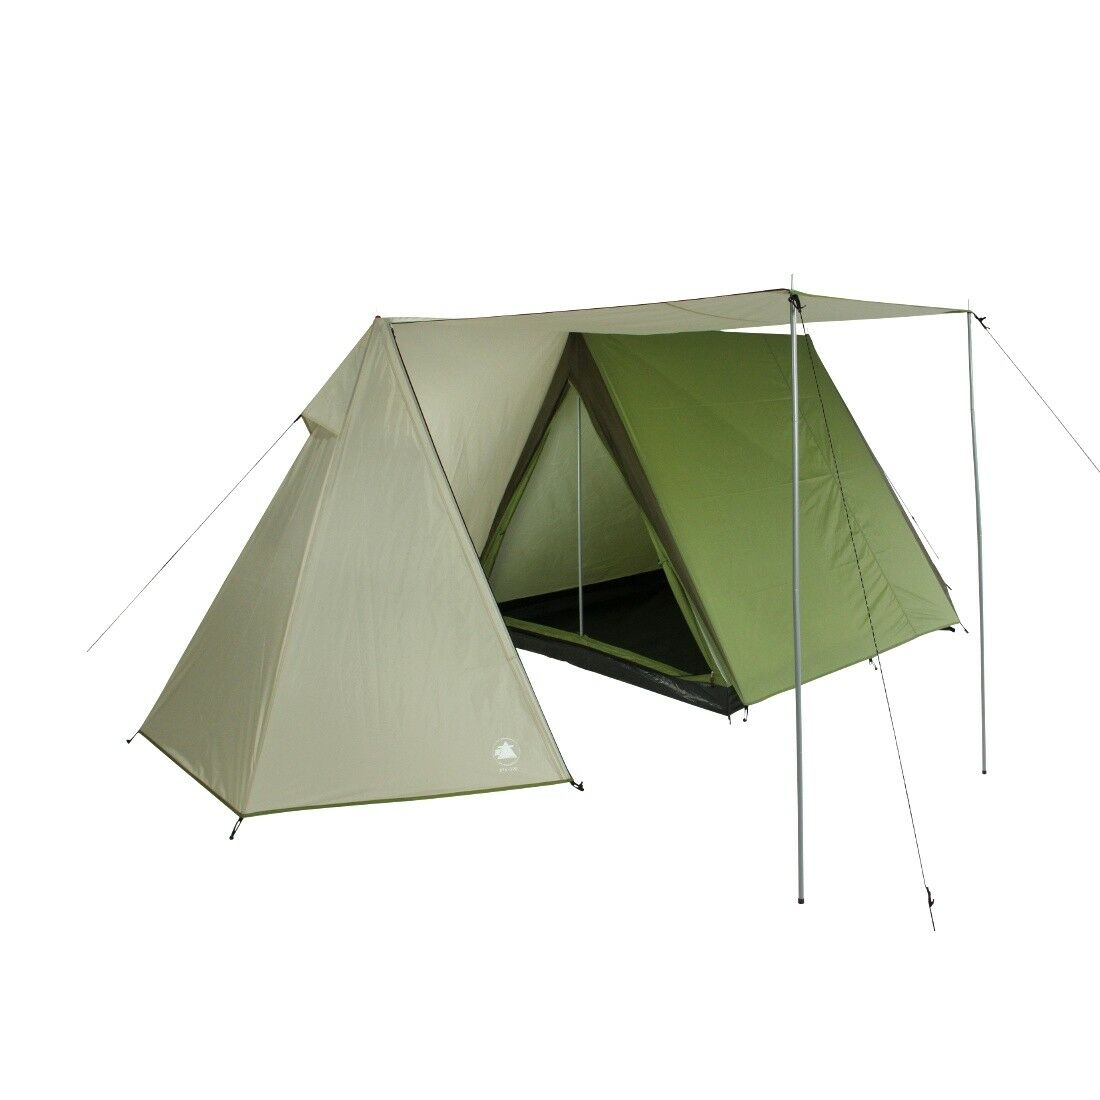 10T Camping-Zelt Mungaroo, 3 Personen Firstzelt, Famili… | 04260181765167